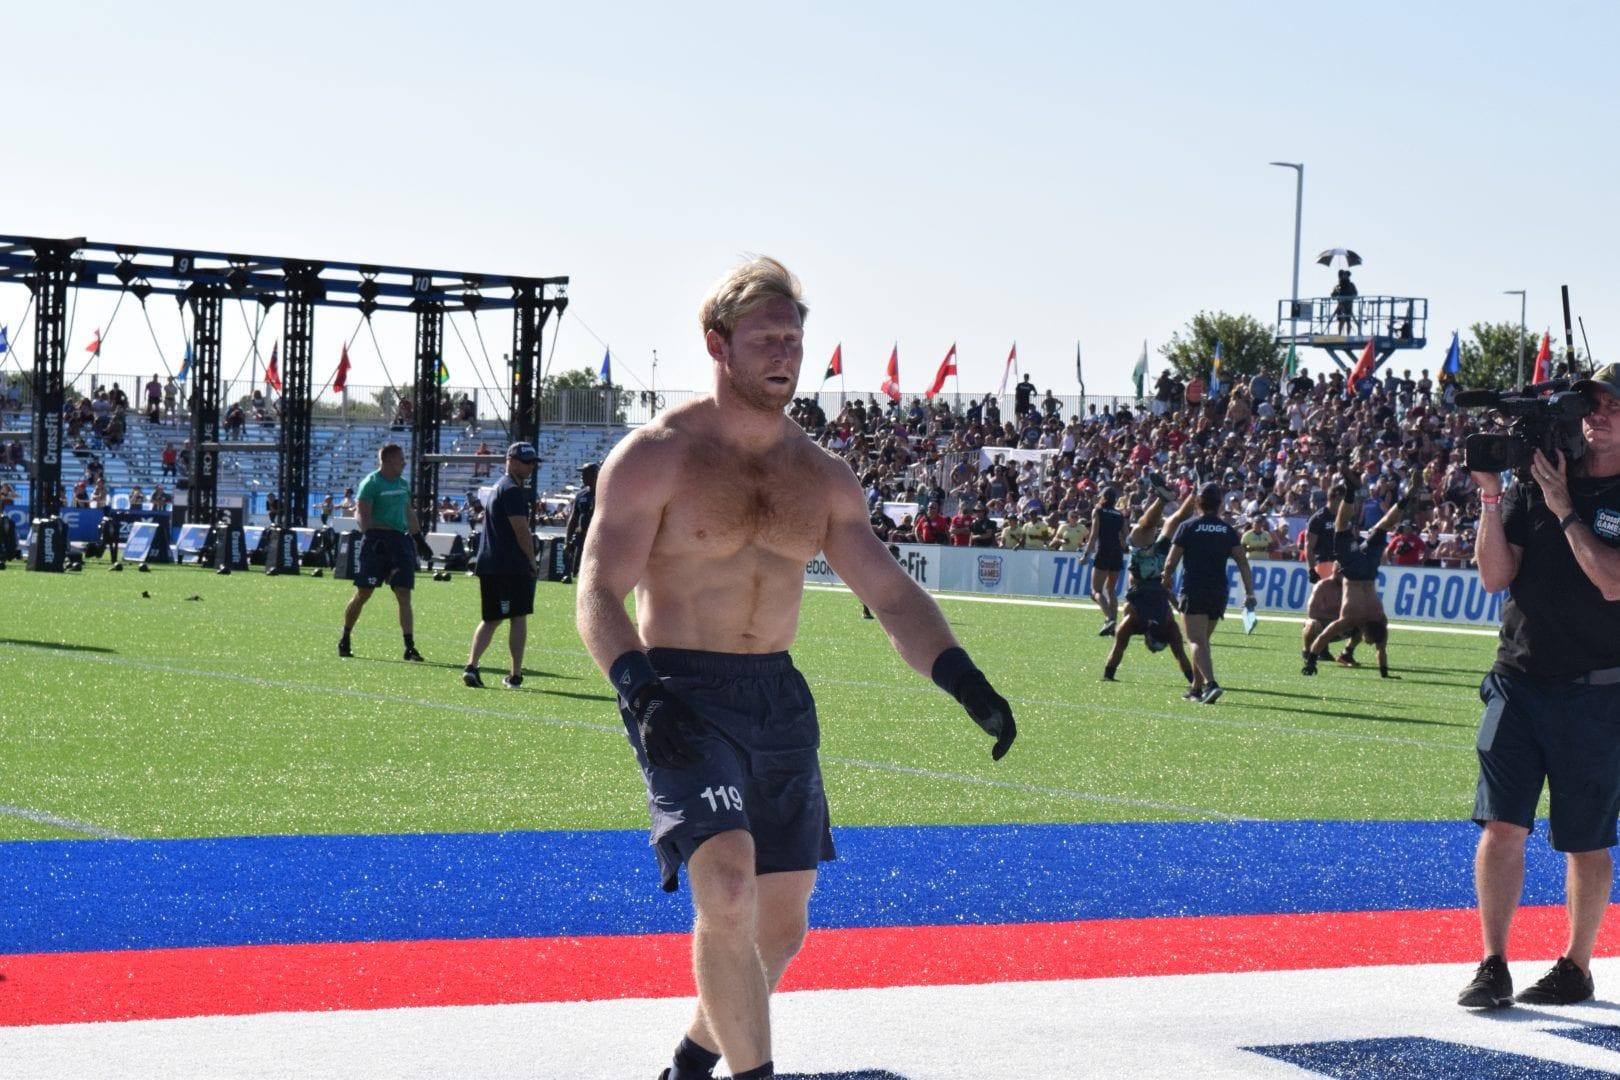 Patrick Vellner crosses the finish line at the 2019 CrossFit Games